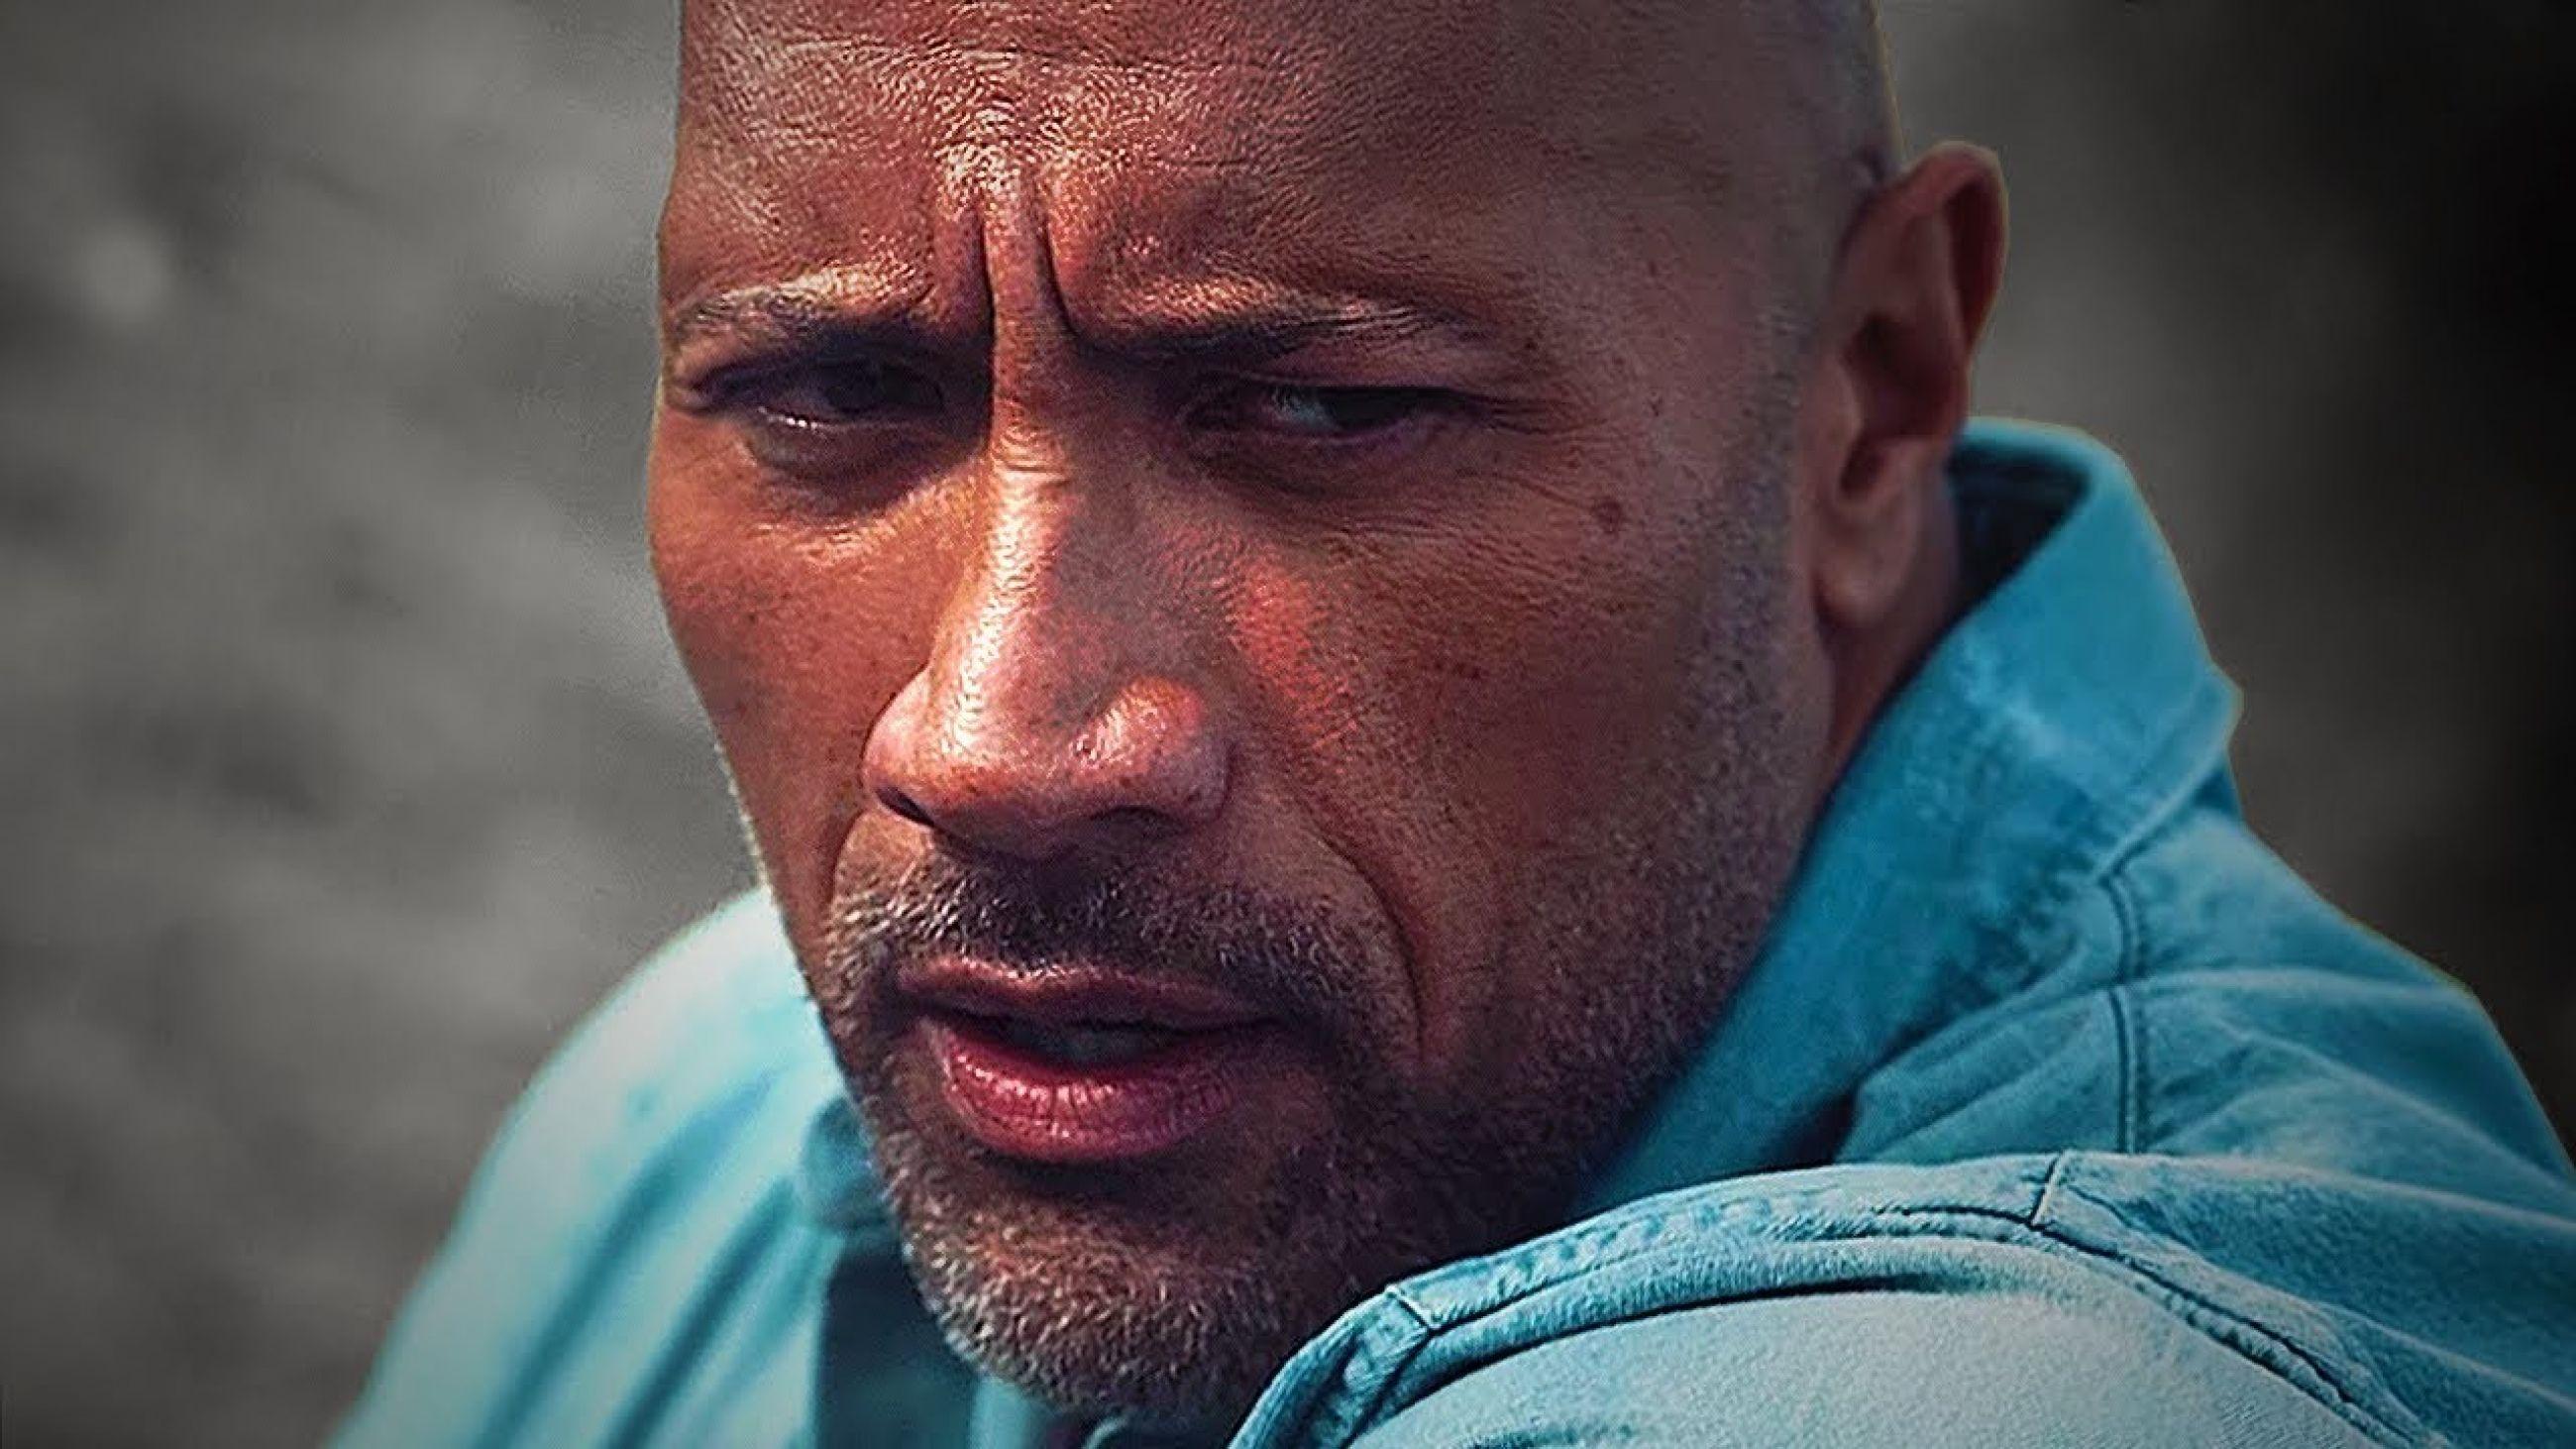 Dwayne Johnson - The Wake Up Call